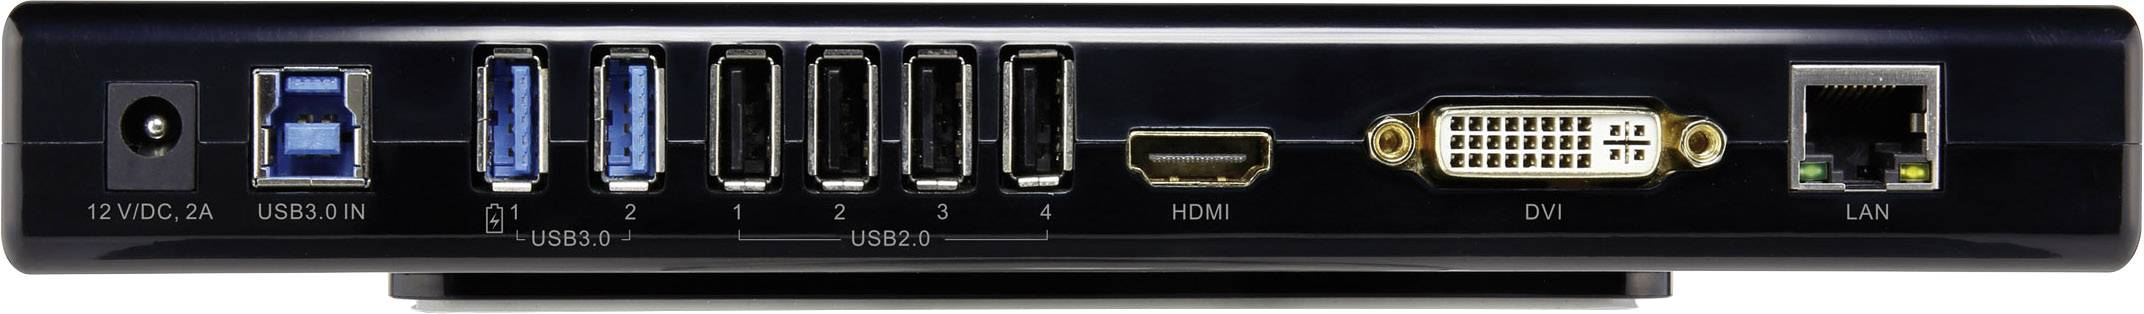 renkforcelaptop docking stationuniversal 2x usb 3 0 4x usb 2 0 1x hdmi headphones [ 1000 x 1000 Pixel ]